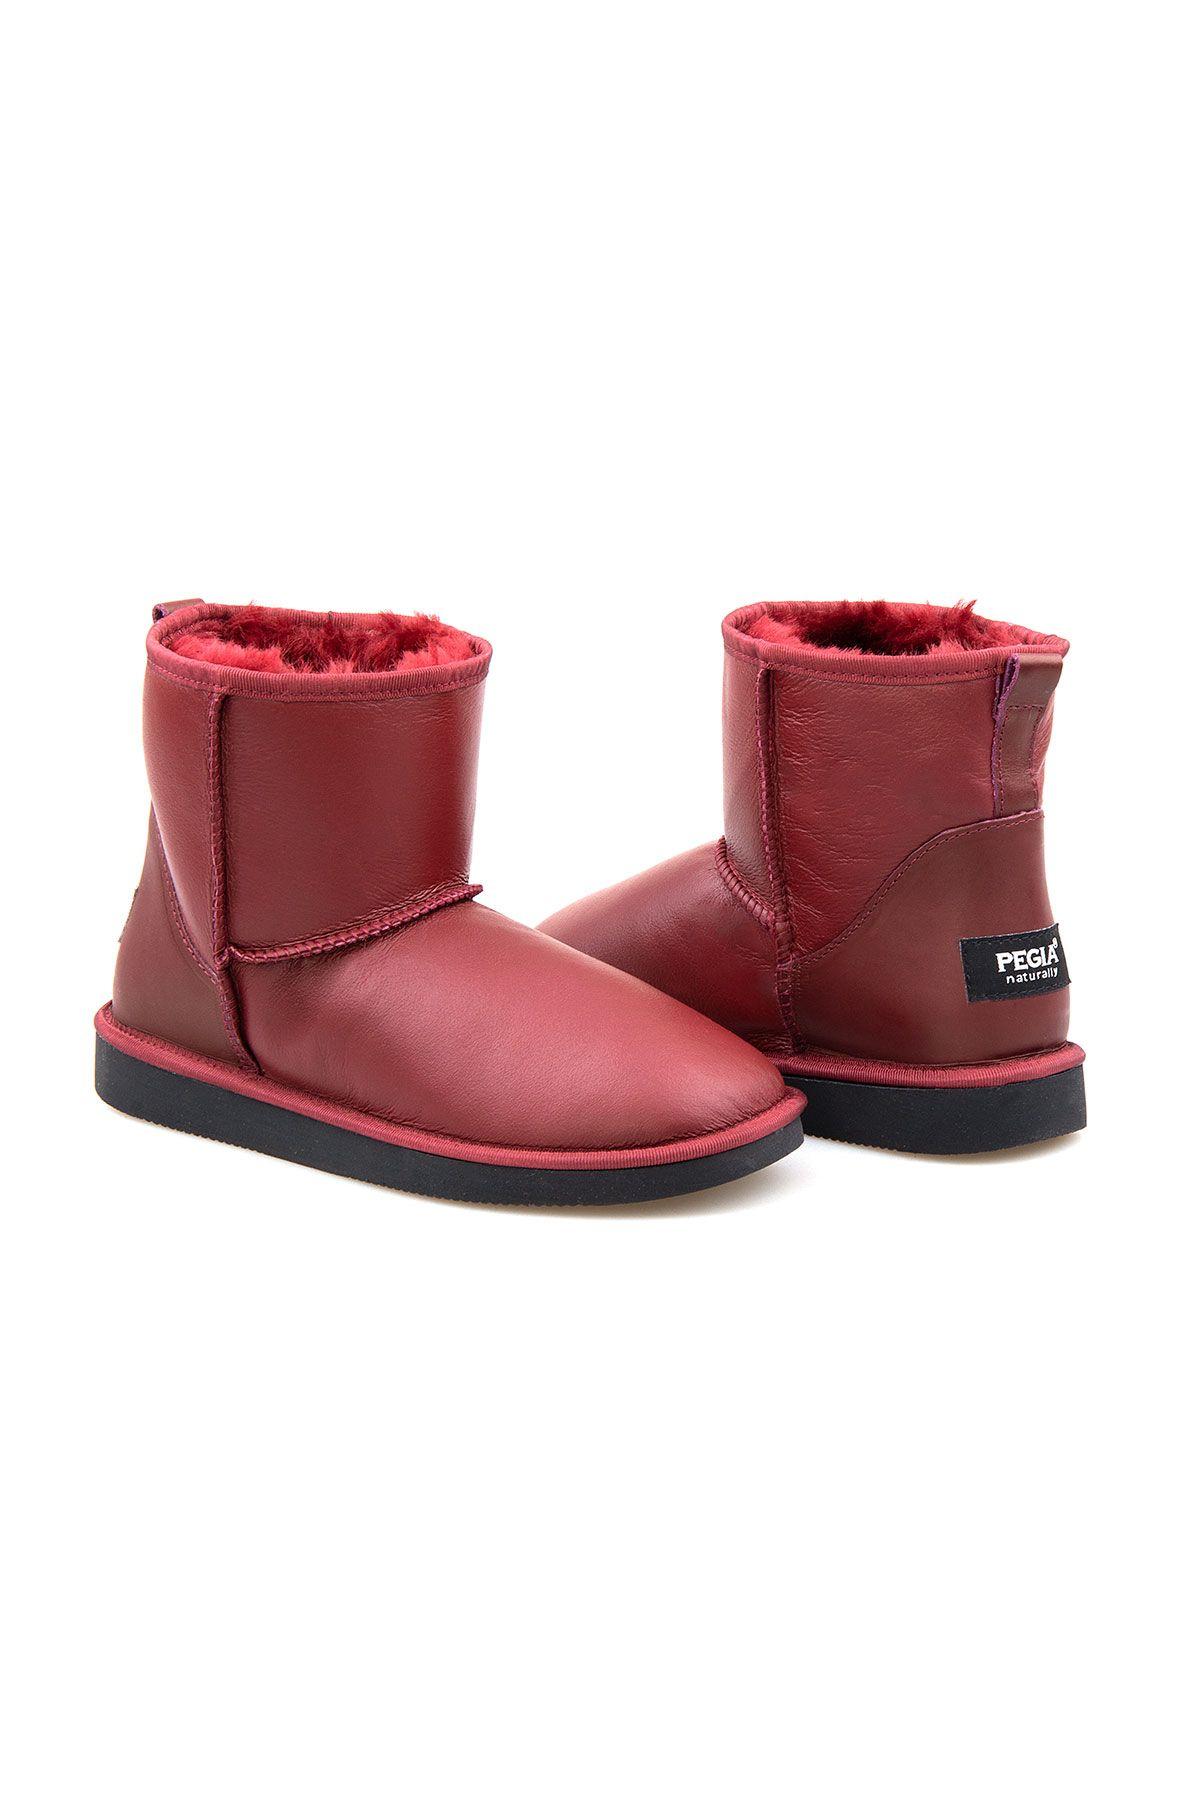 Pegia Women's Sheepskin Boots 191022 Claret red